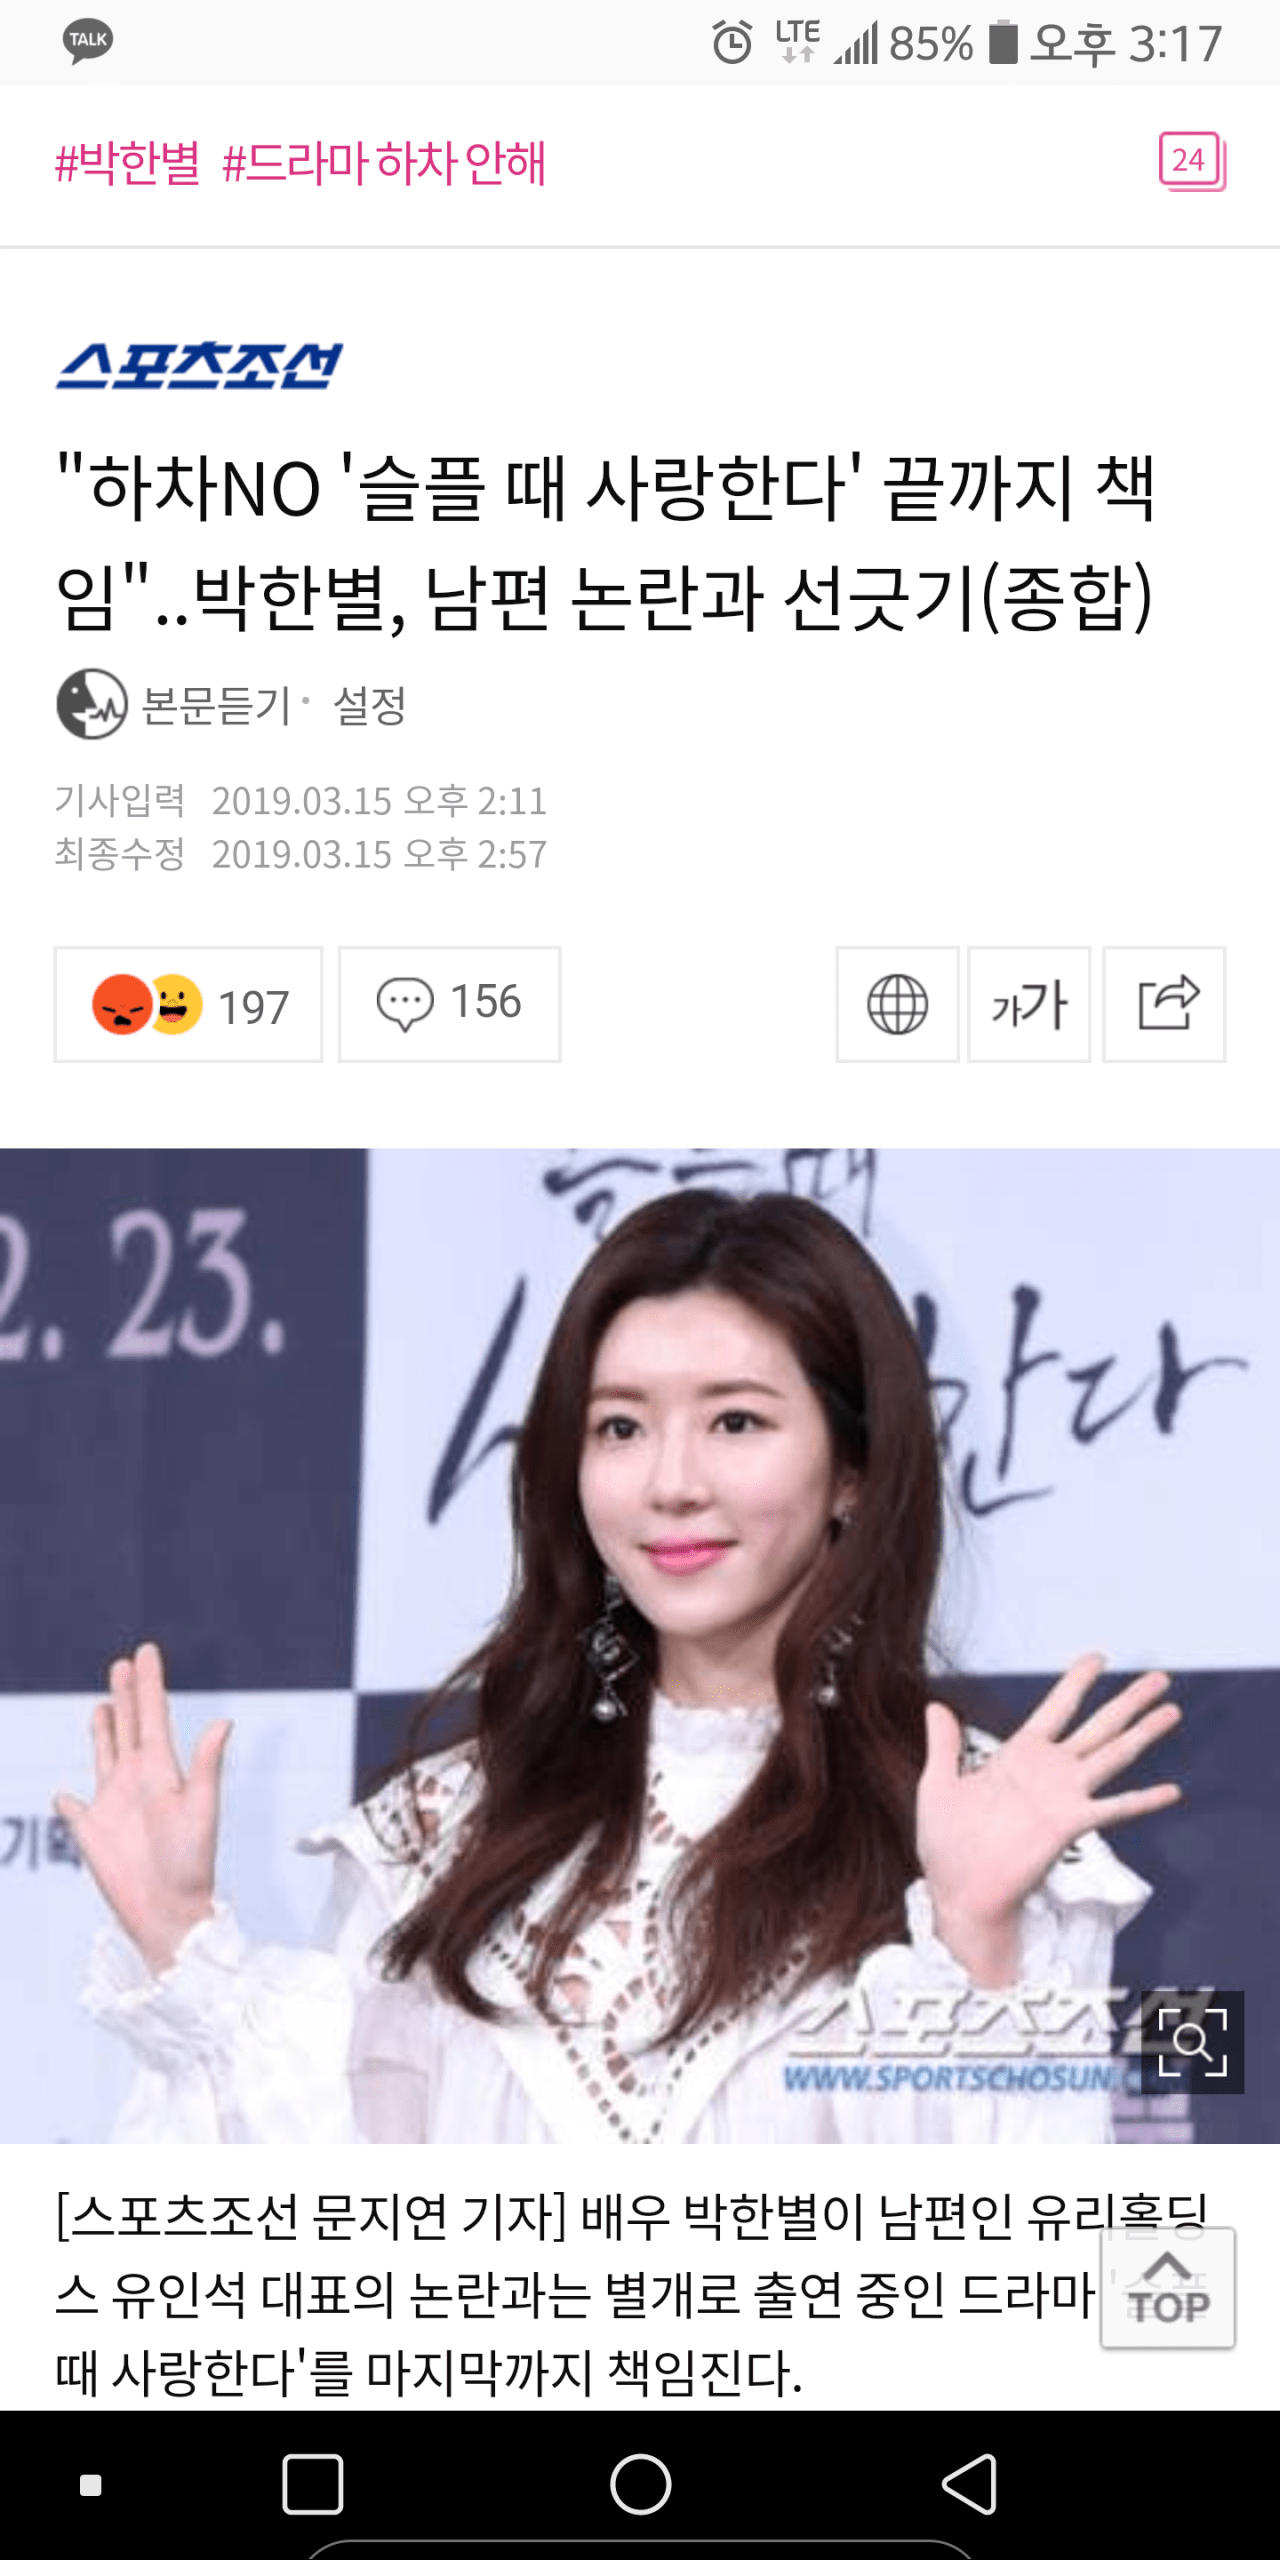 Screenshot_2019-03-15-15-17-24.png 박한별 드라마 하차안하는게 왜 논란임?